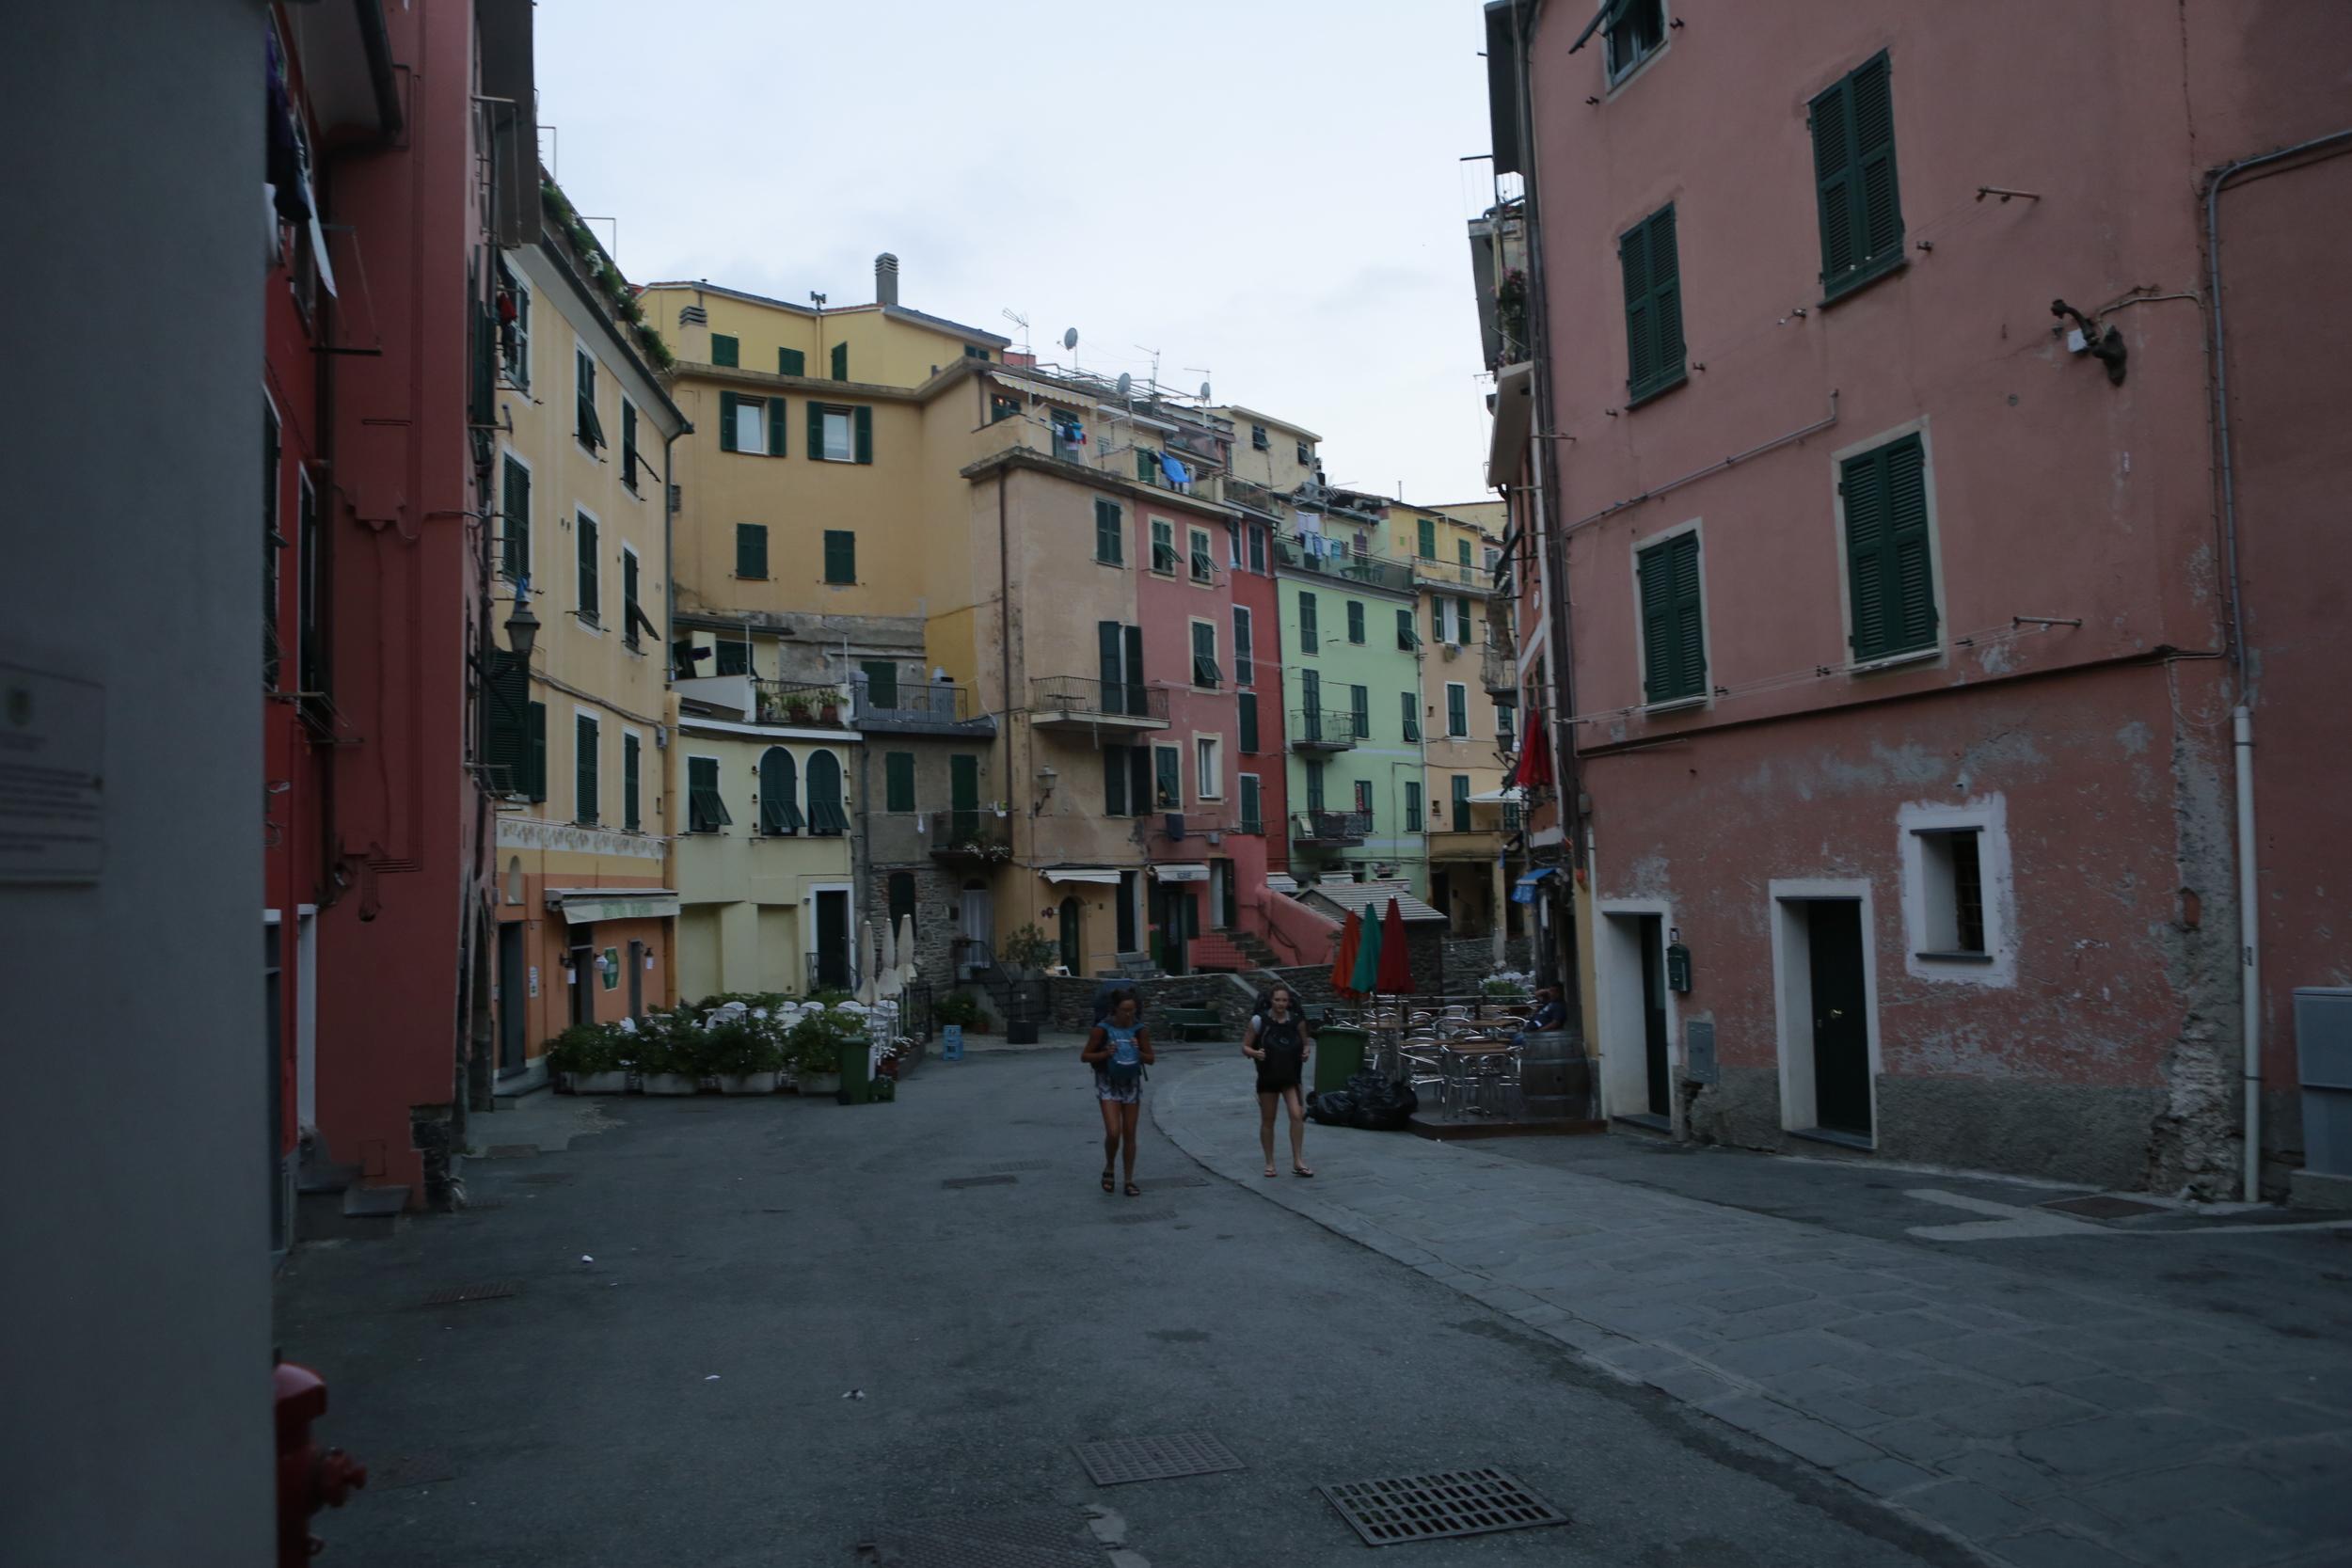 Vernazza, Cinque Terre in the morning